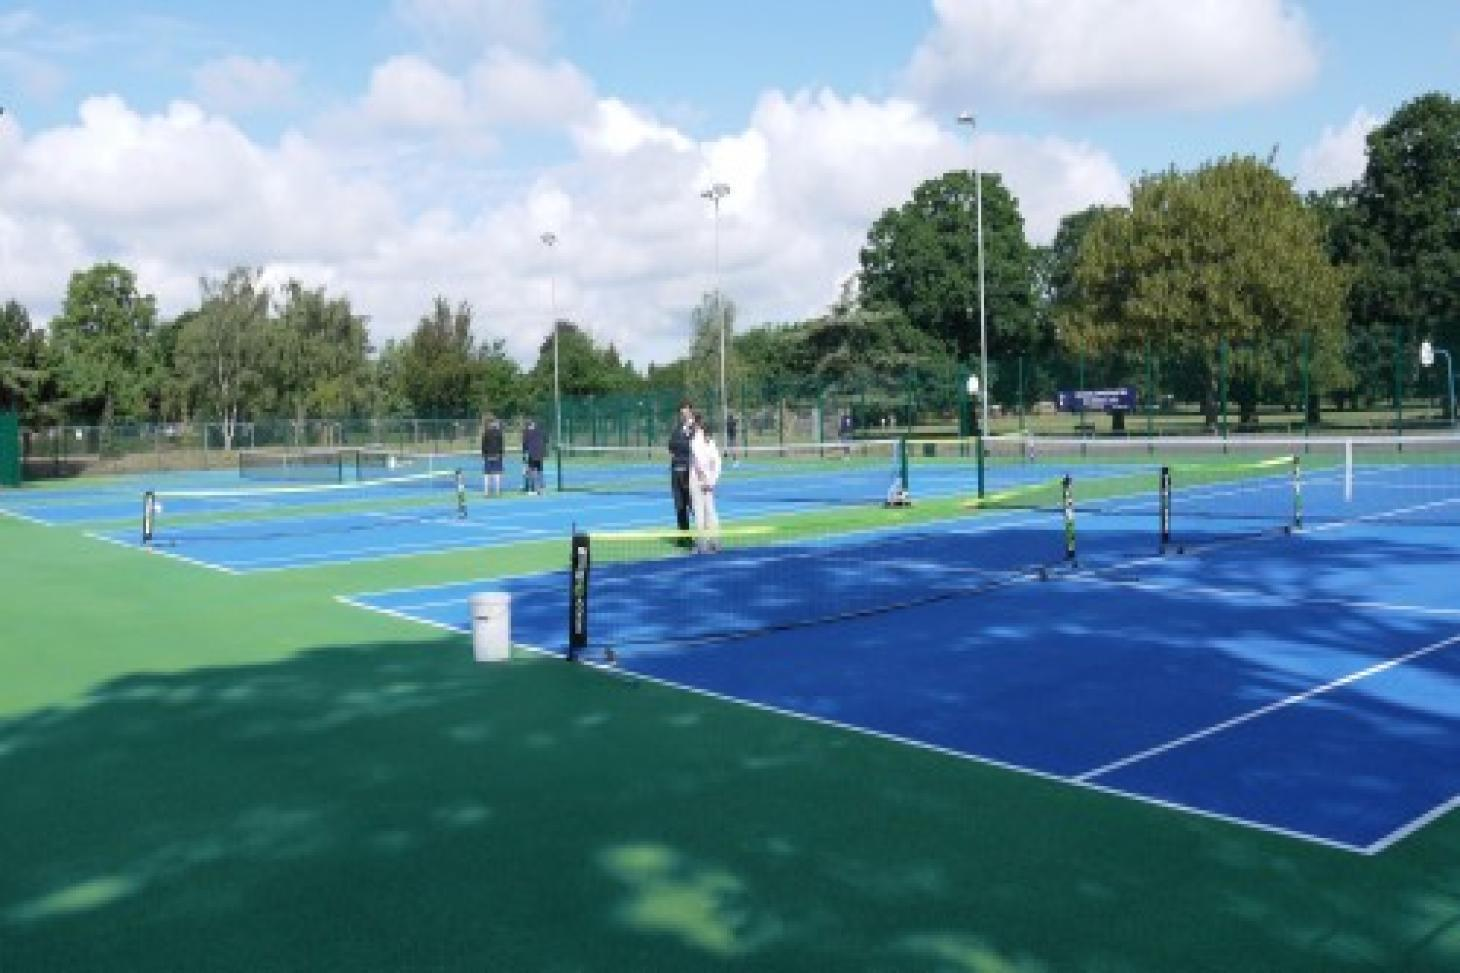 Bruce Castle Park Outdoor   Hard (macadam) tennis court